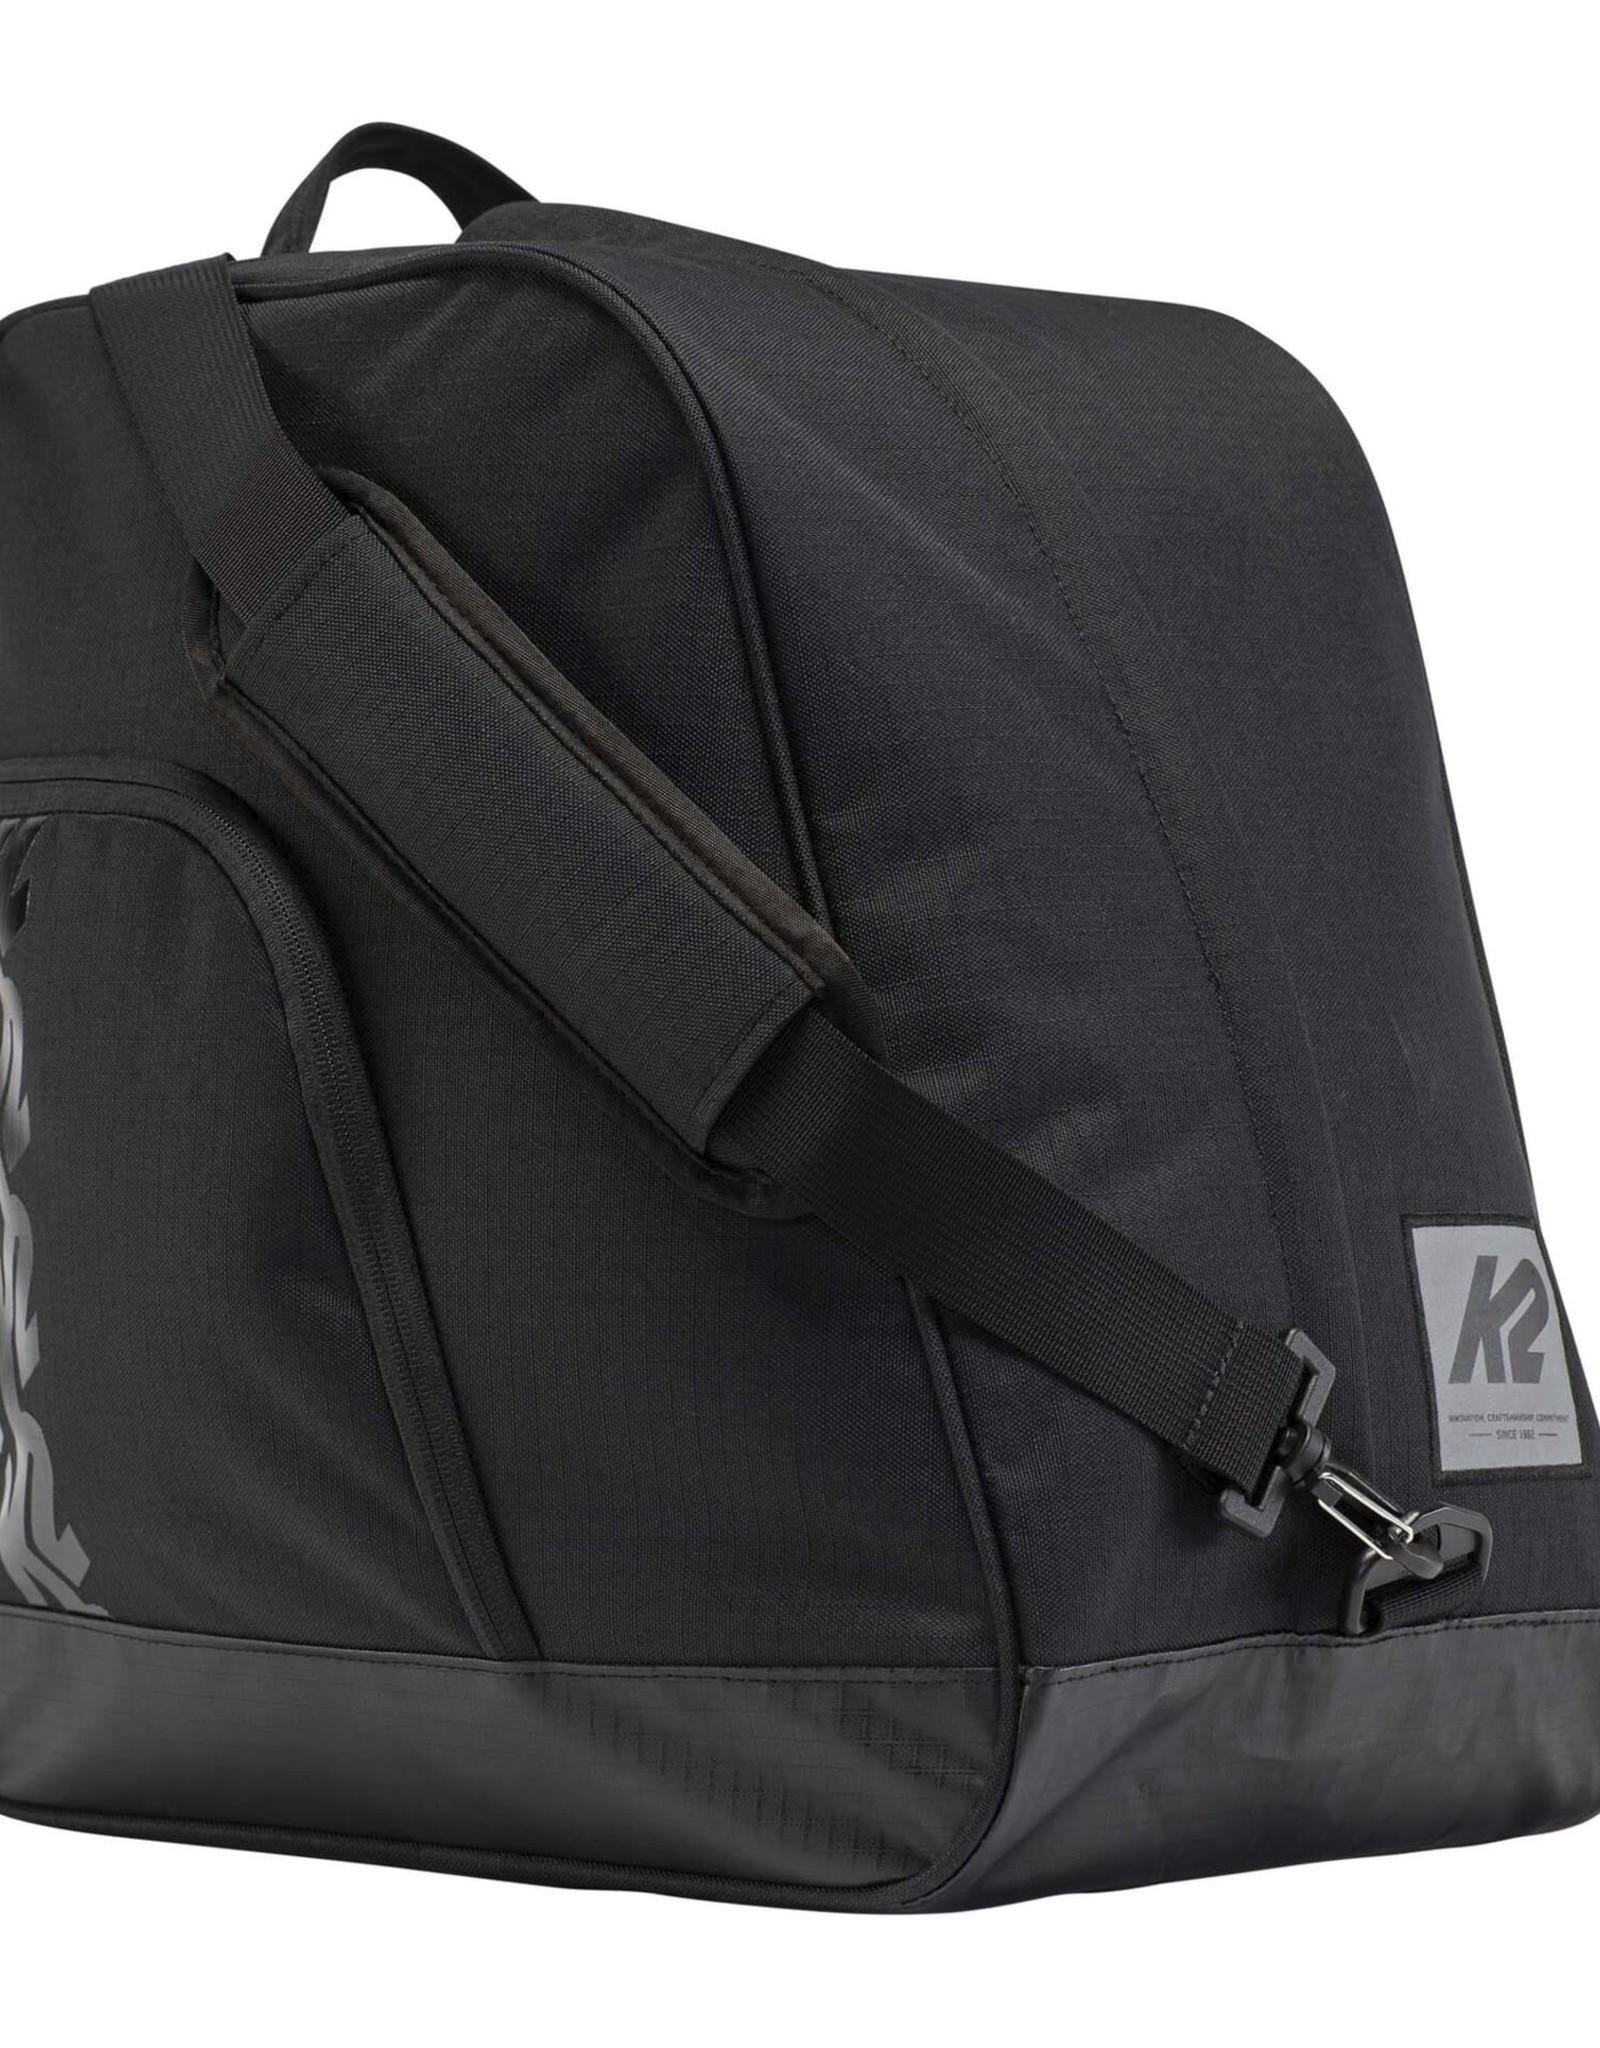 K2 K2 BOOT BAG Black